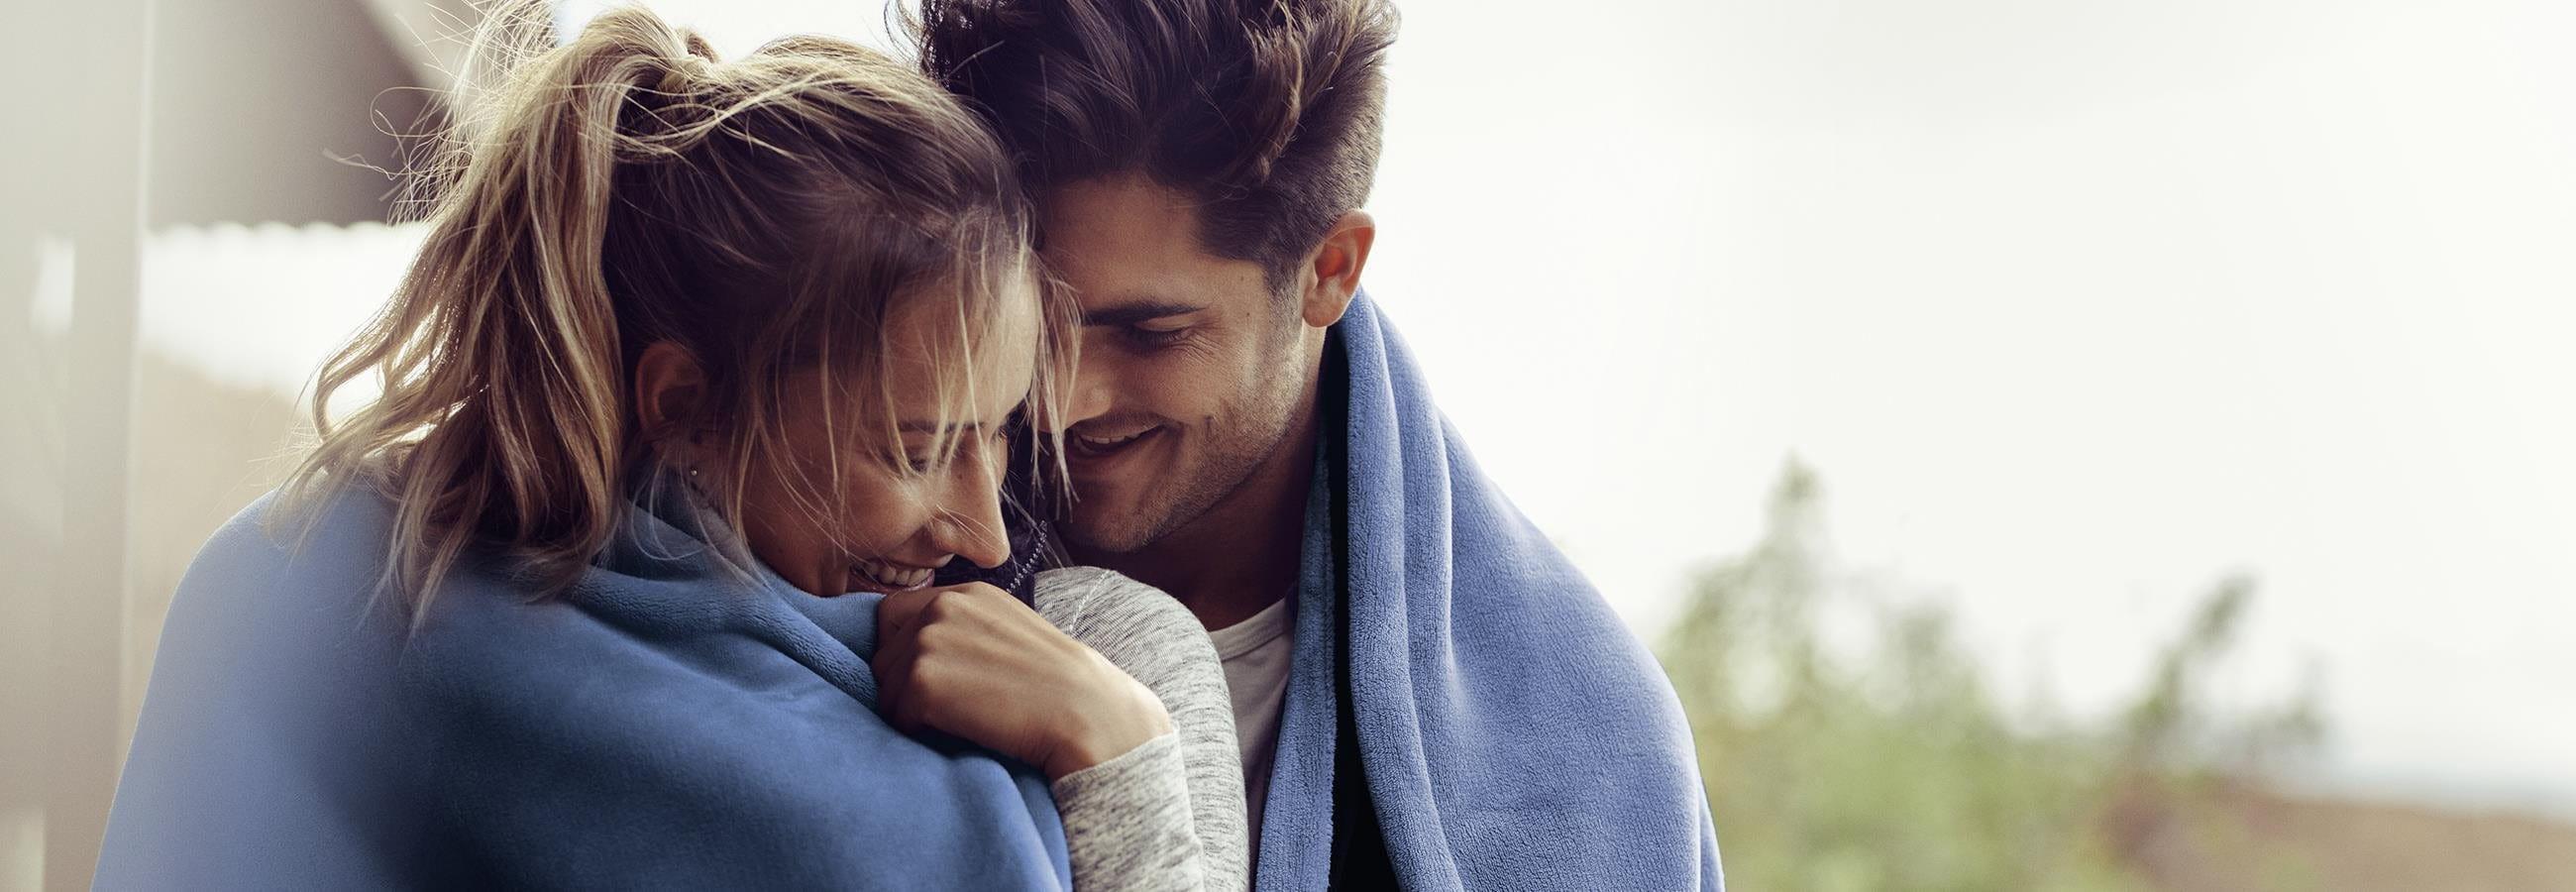 Frau und Mann mit Wolldecke